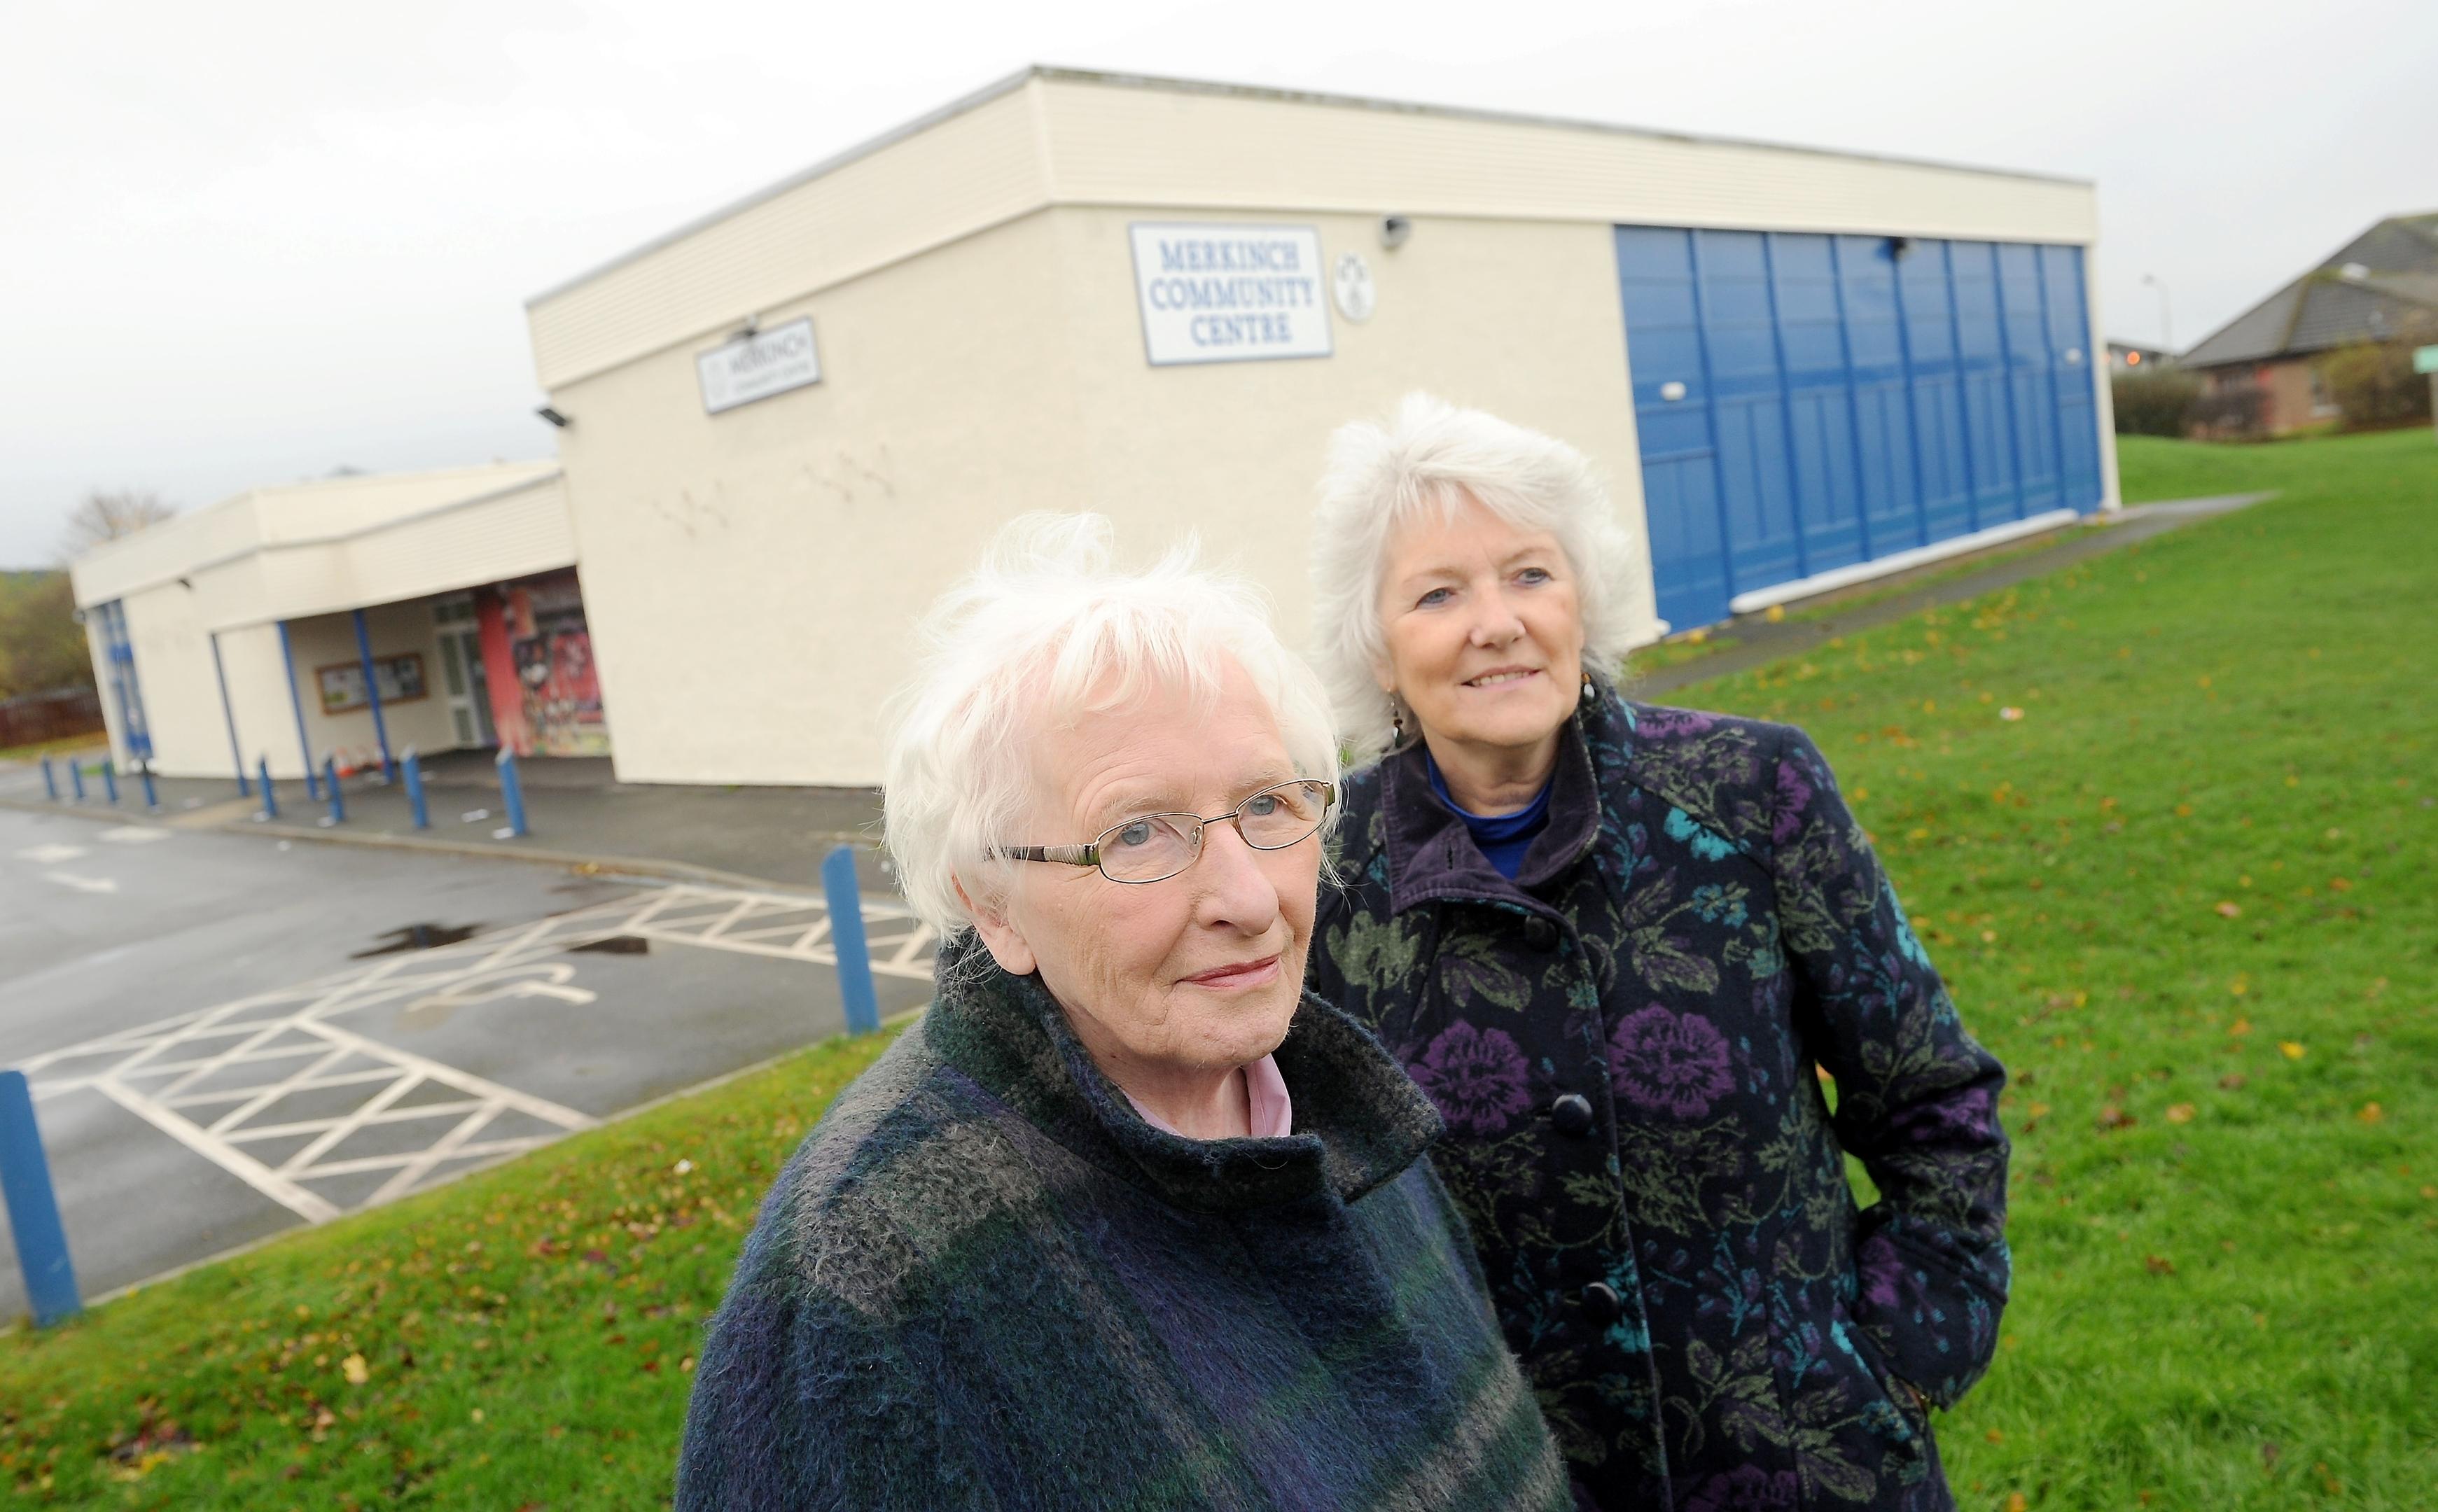 Anne McCreadie (left) Chairwoman of the Merkinch Community Centre Association, said move put strain on older voters